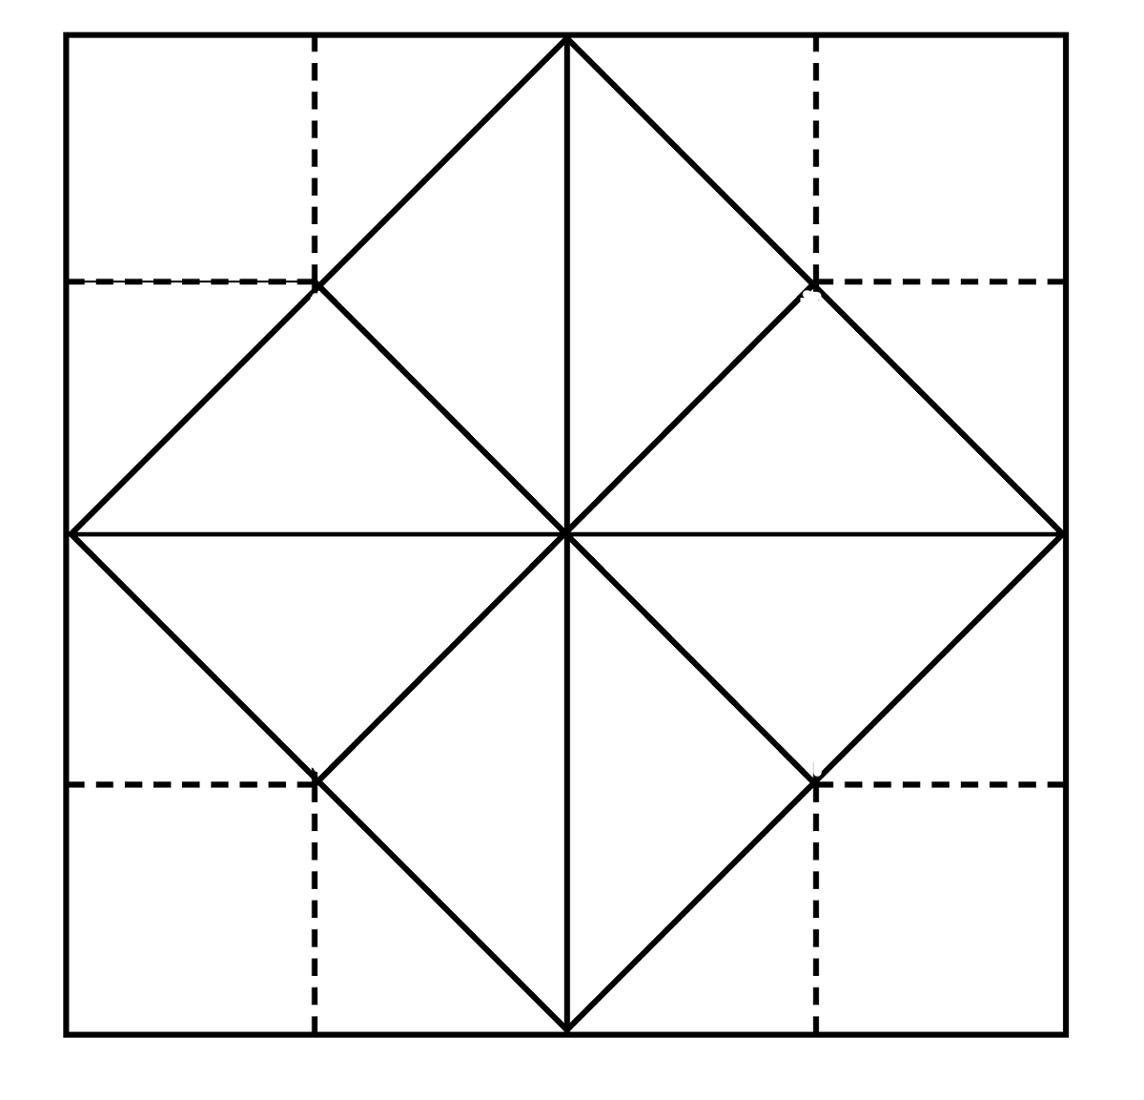 blank fortune teller paper game